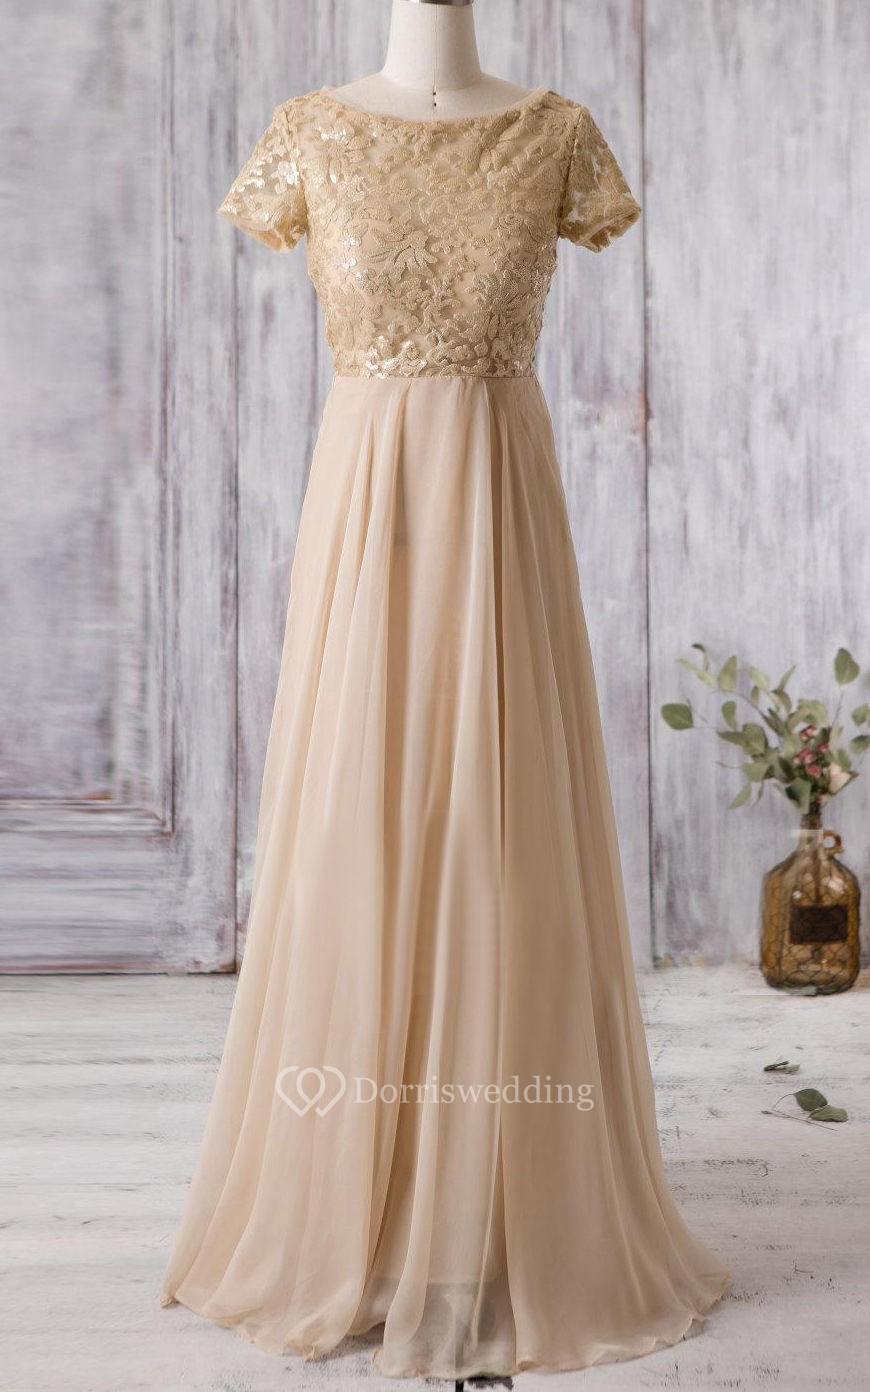 Bateau Neck A-line Pleated Chiffon Long Dress With Lace ...